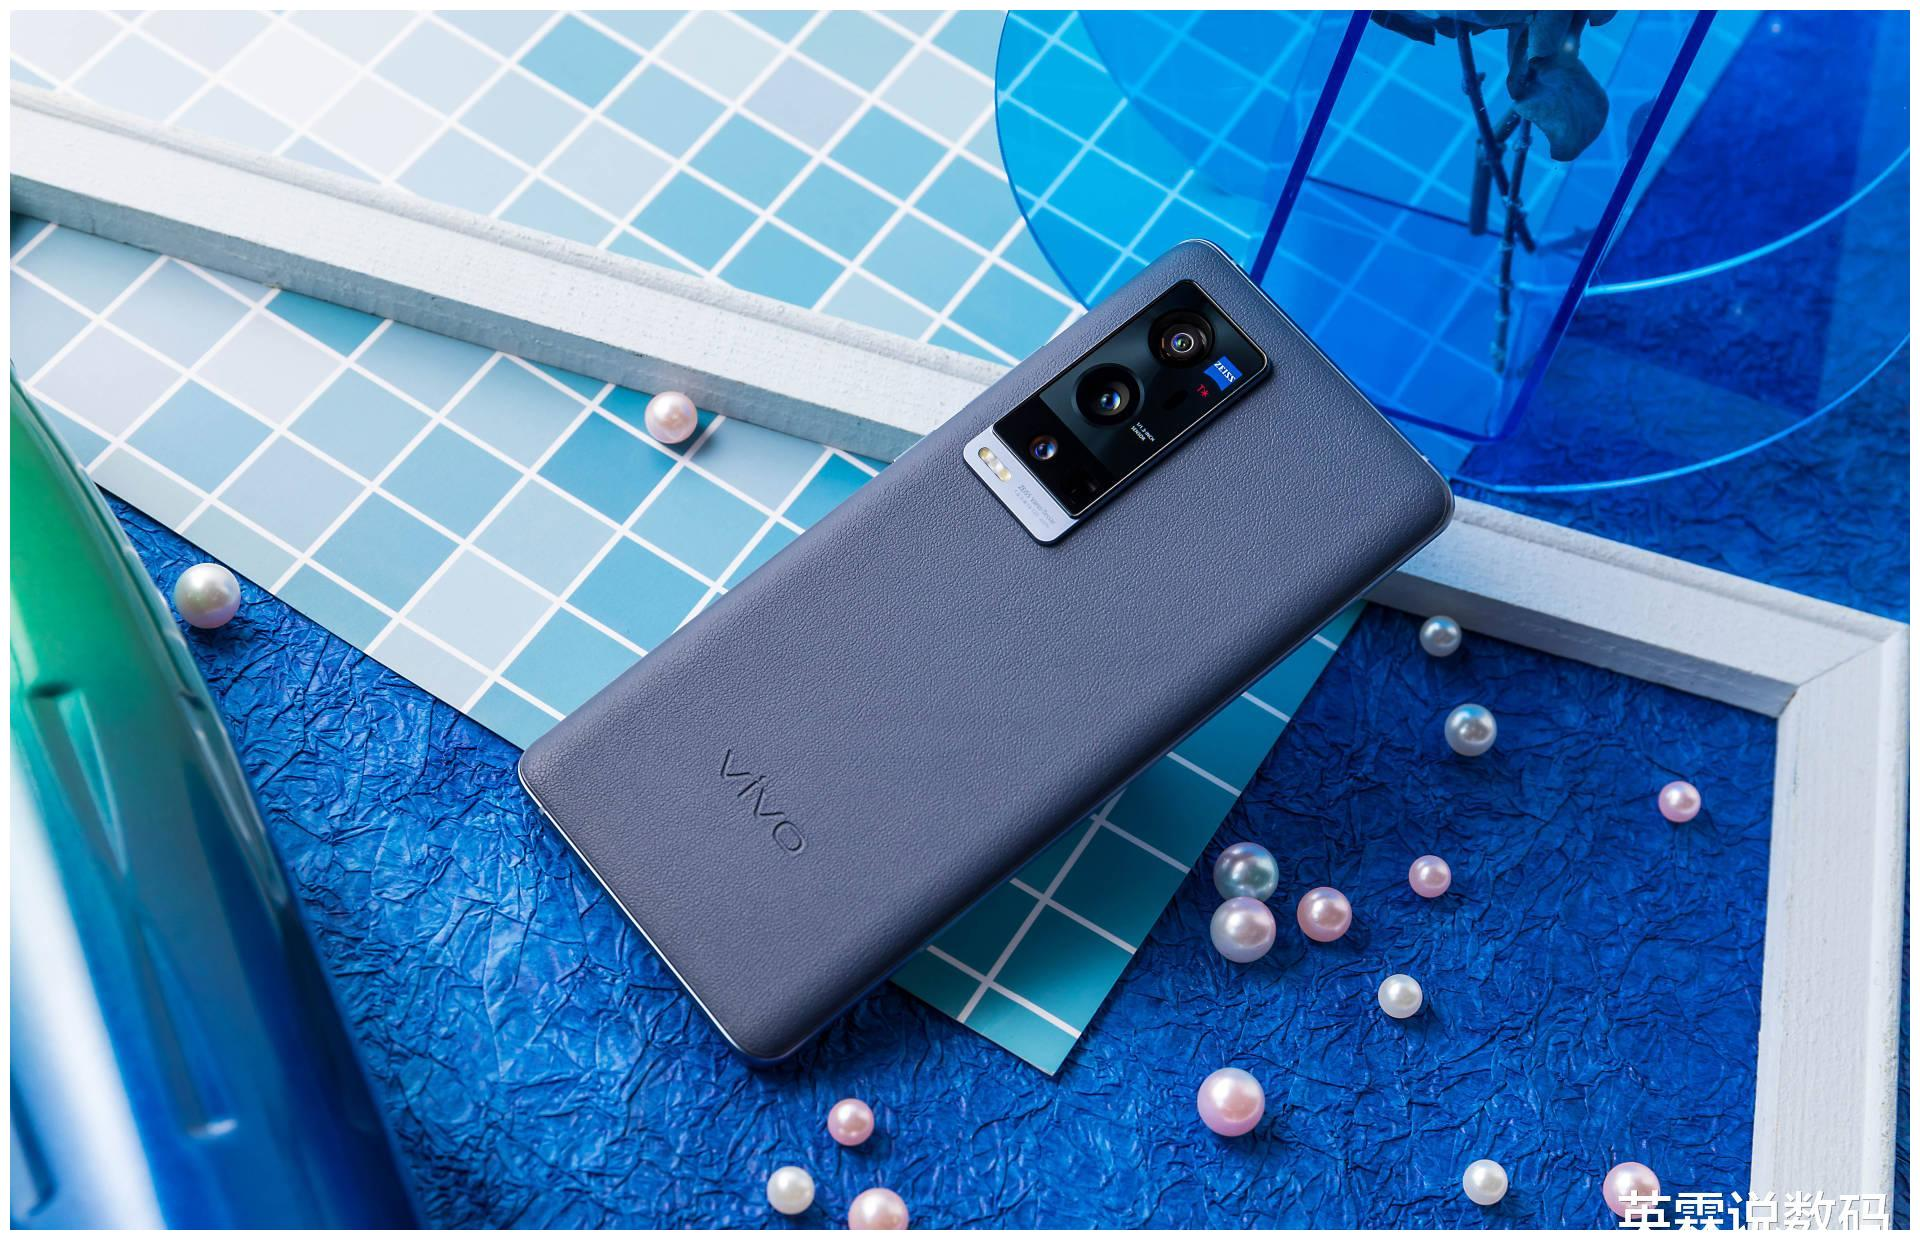 vivo X60 Pro+实测!性能有惊喜,游戏体验佳